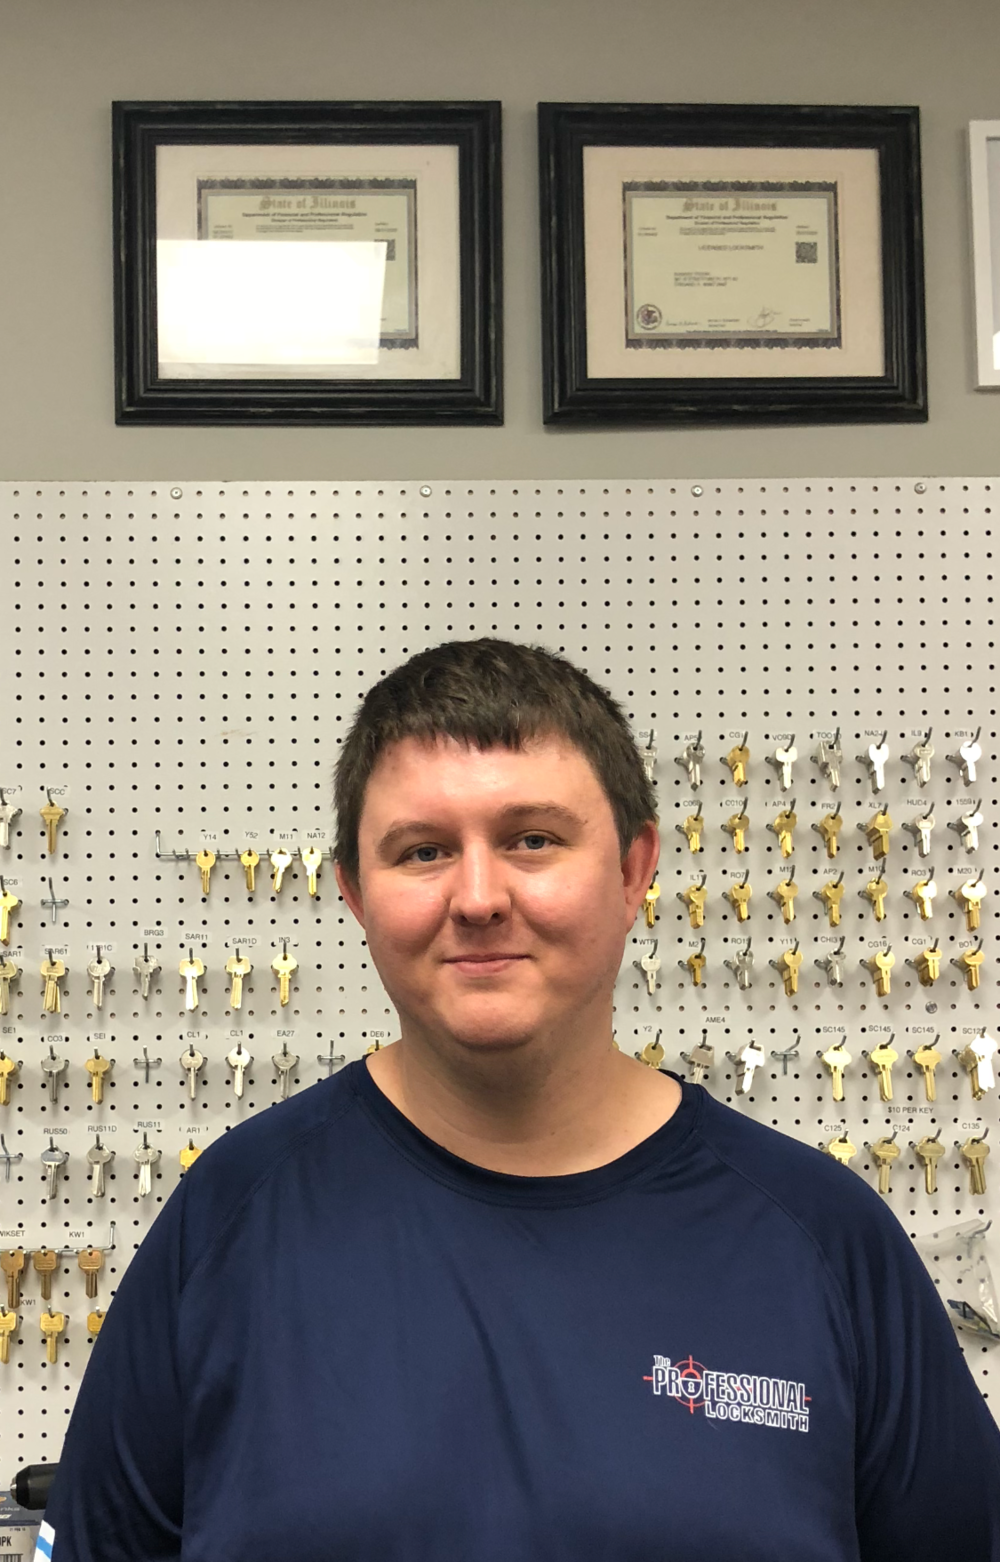 Rick W - The Professional Locksmith Dispatcher